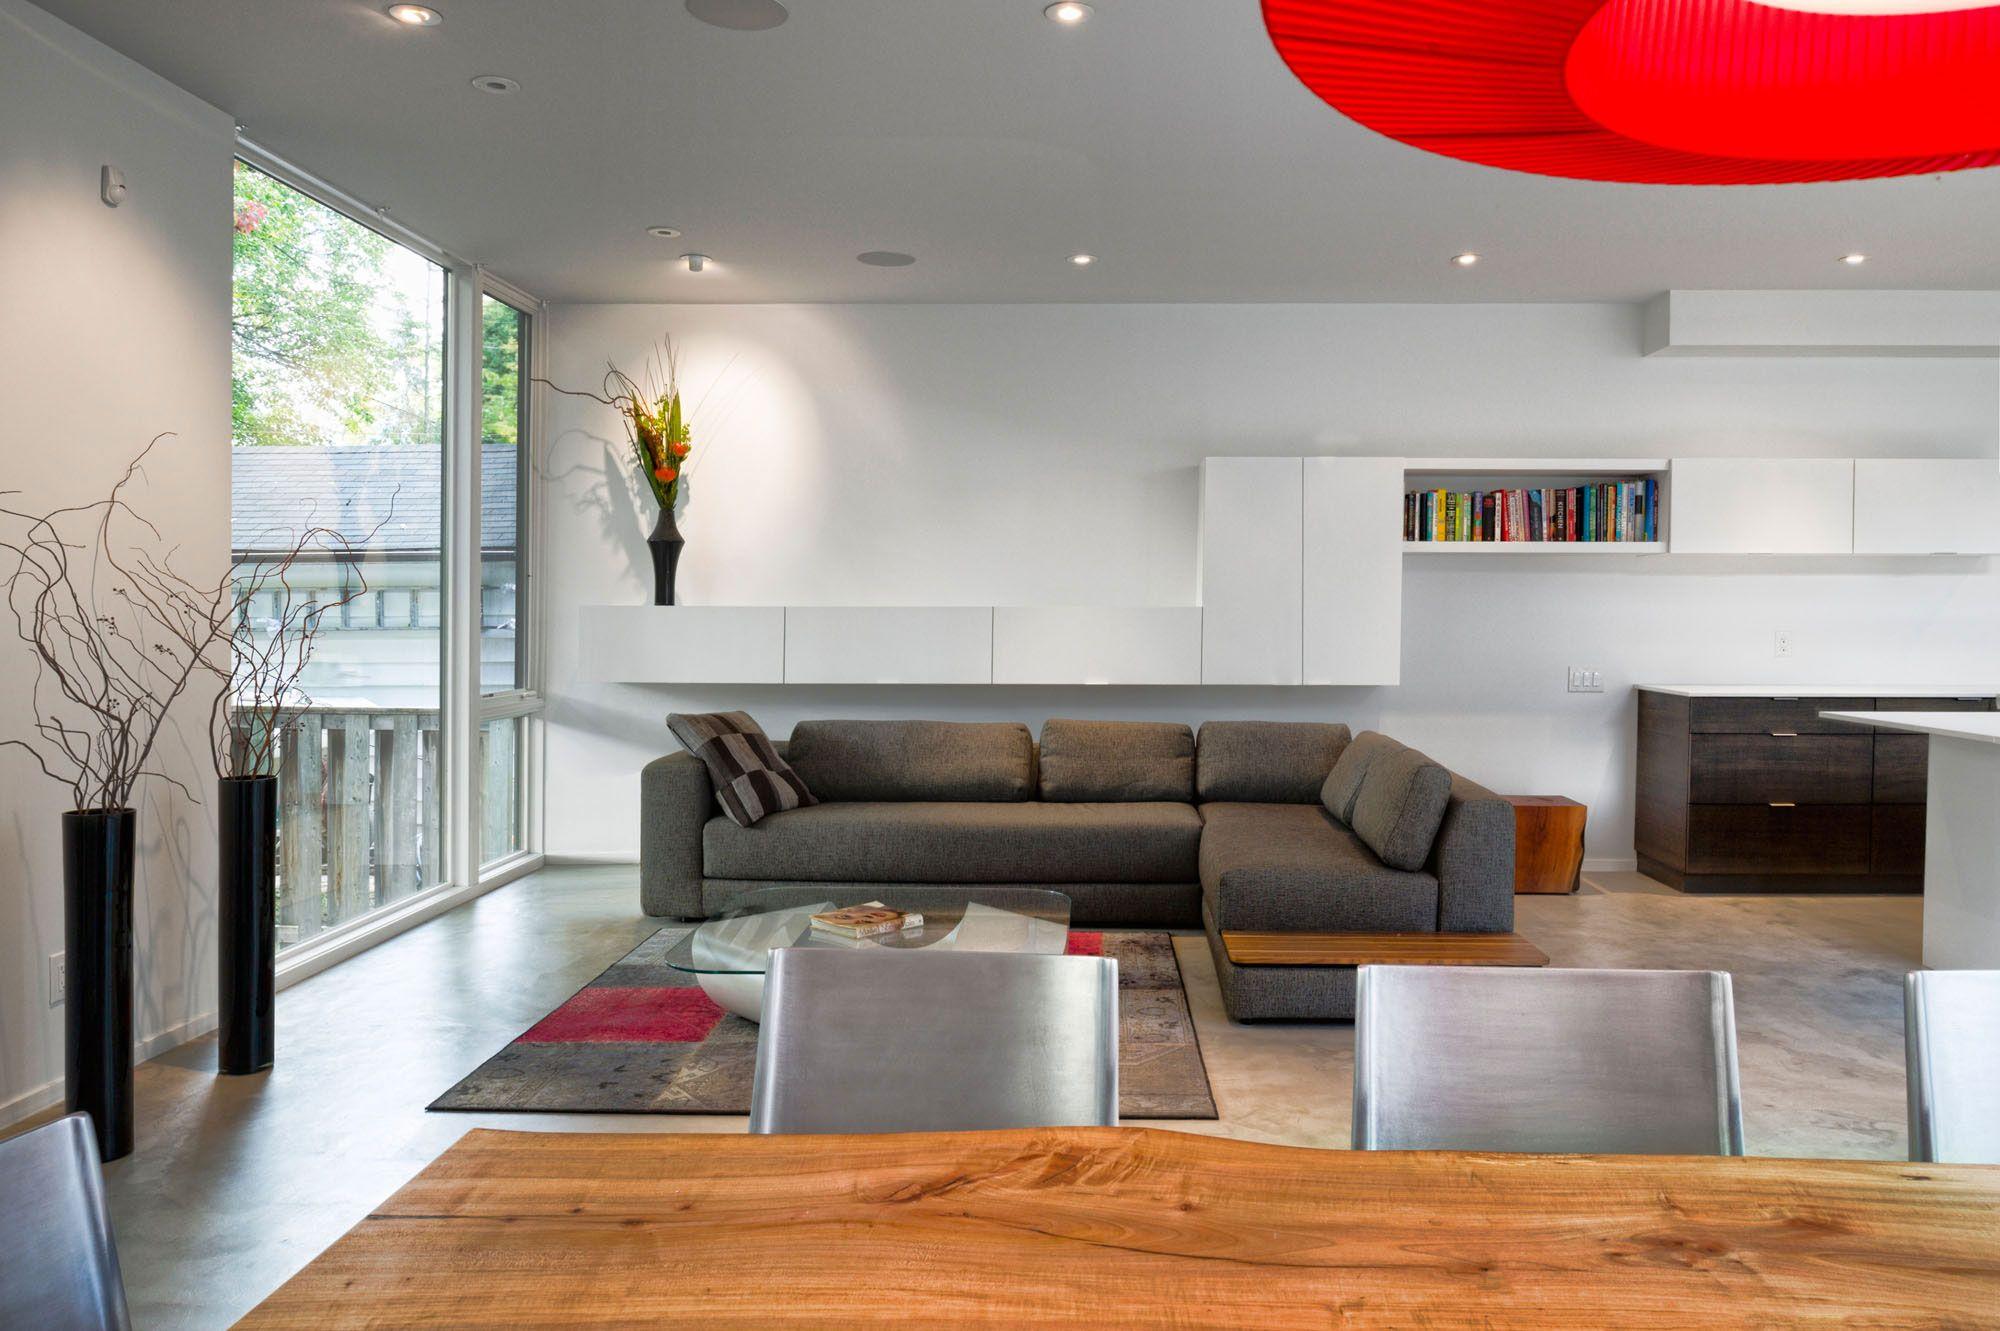 Kết Quả Hình ảnh Cho Minimalist Concrete Living Room Design Ideas